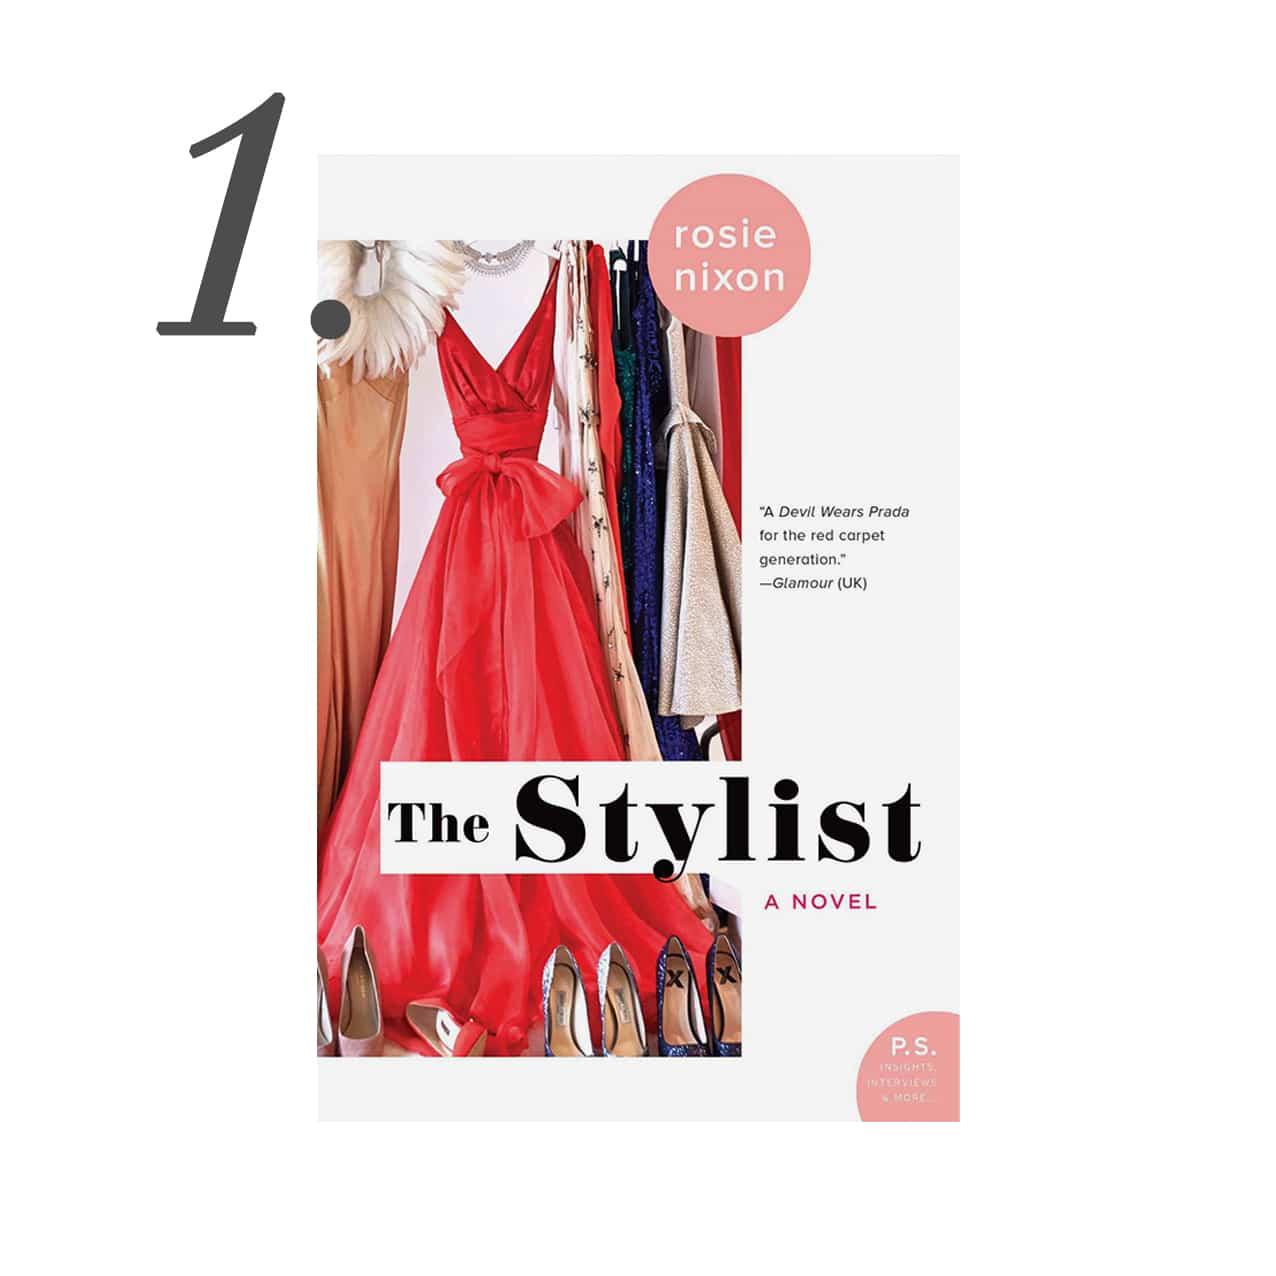 The Stylist A Novel by Rosie Nixon | www.ashleybrookedesigns.com